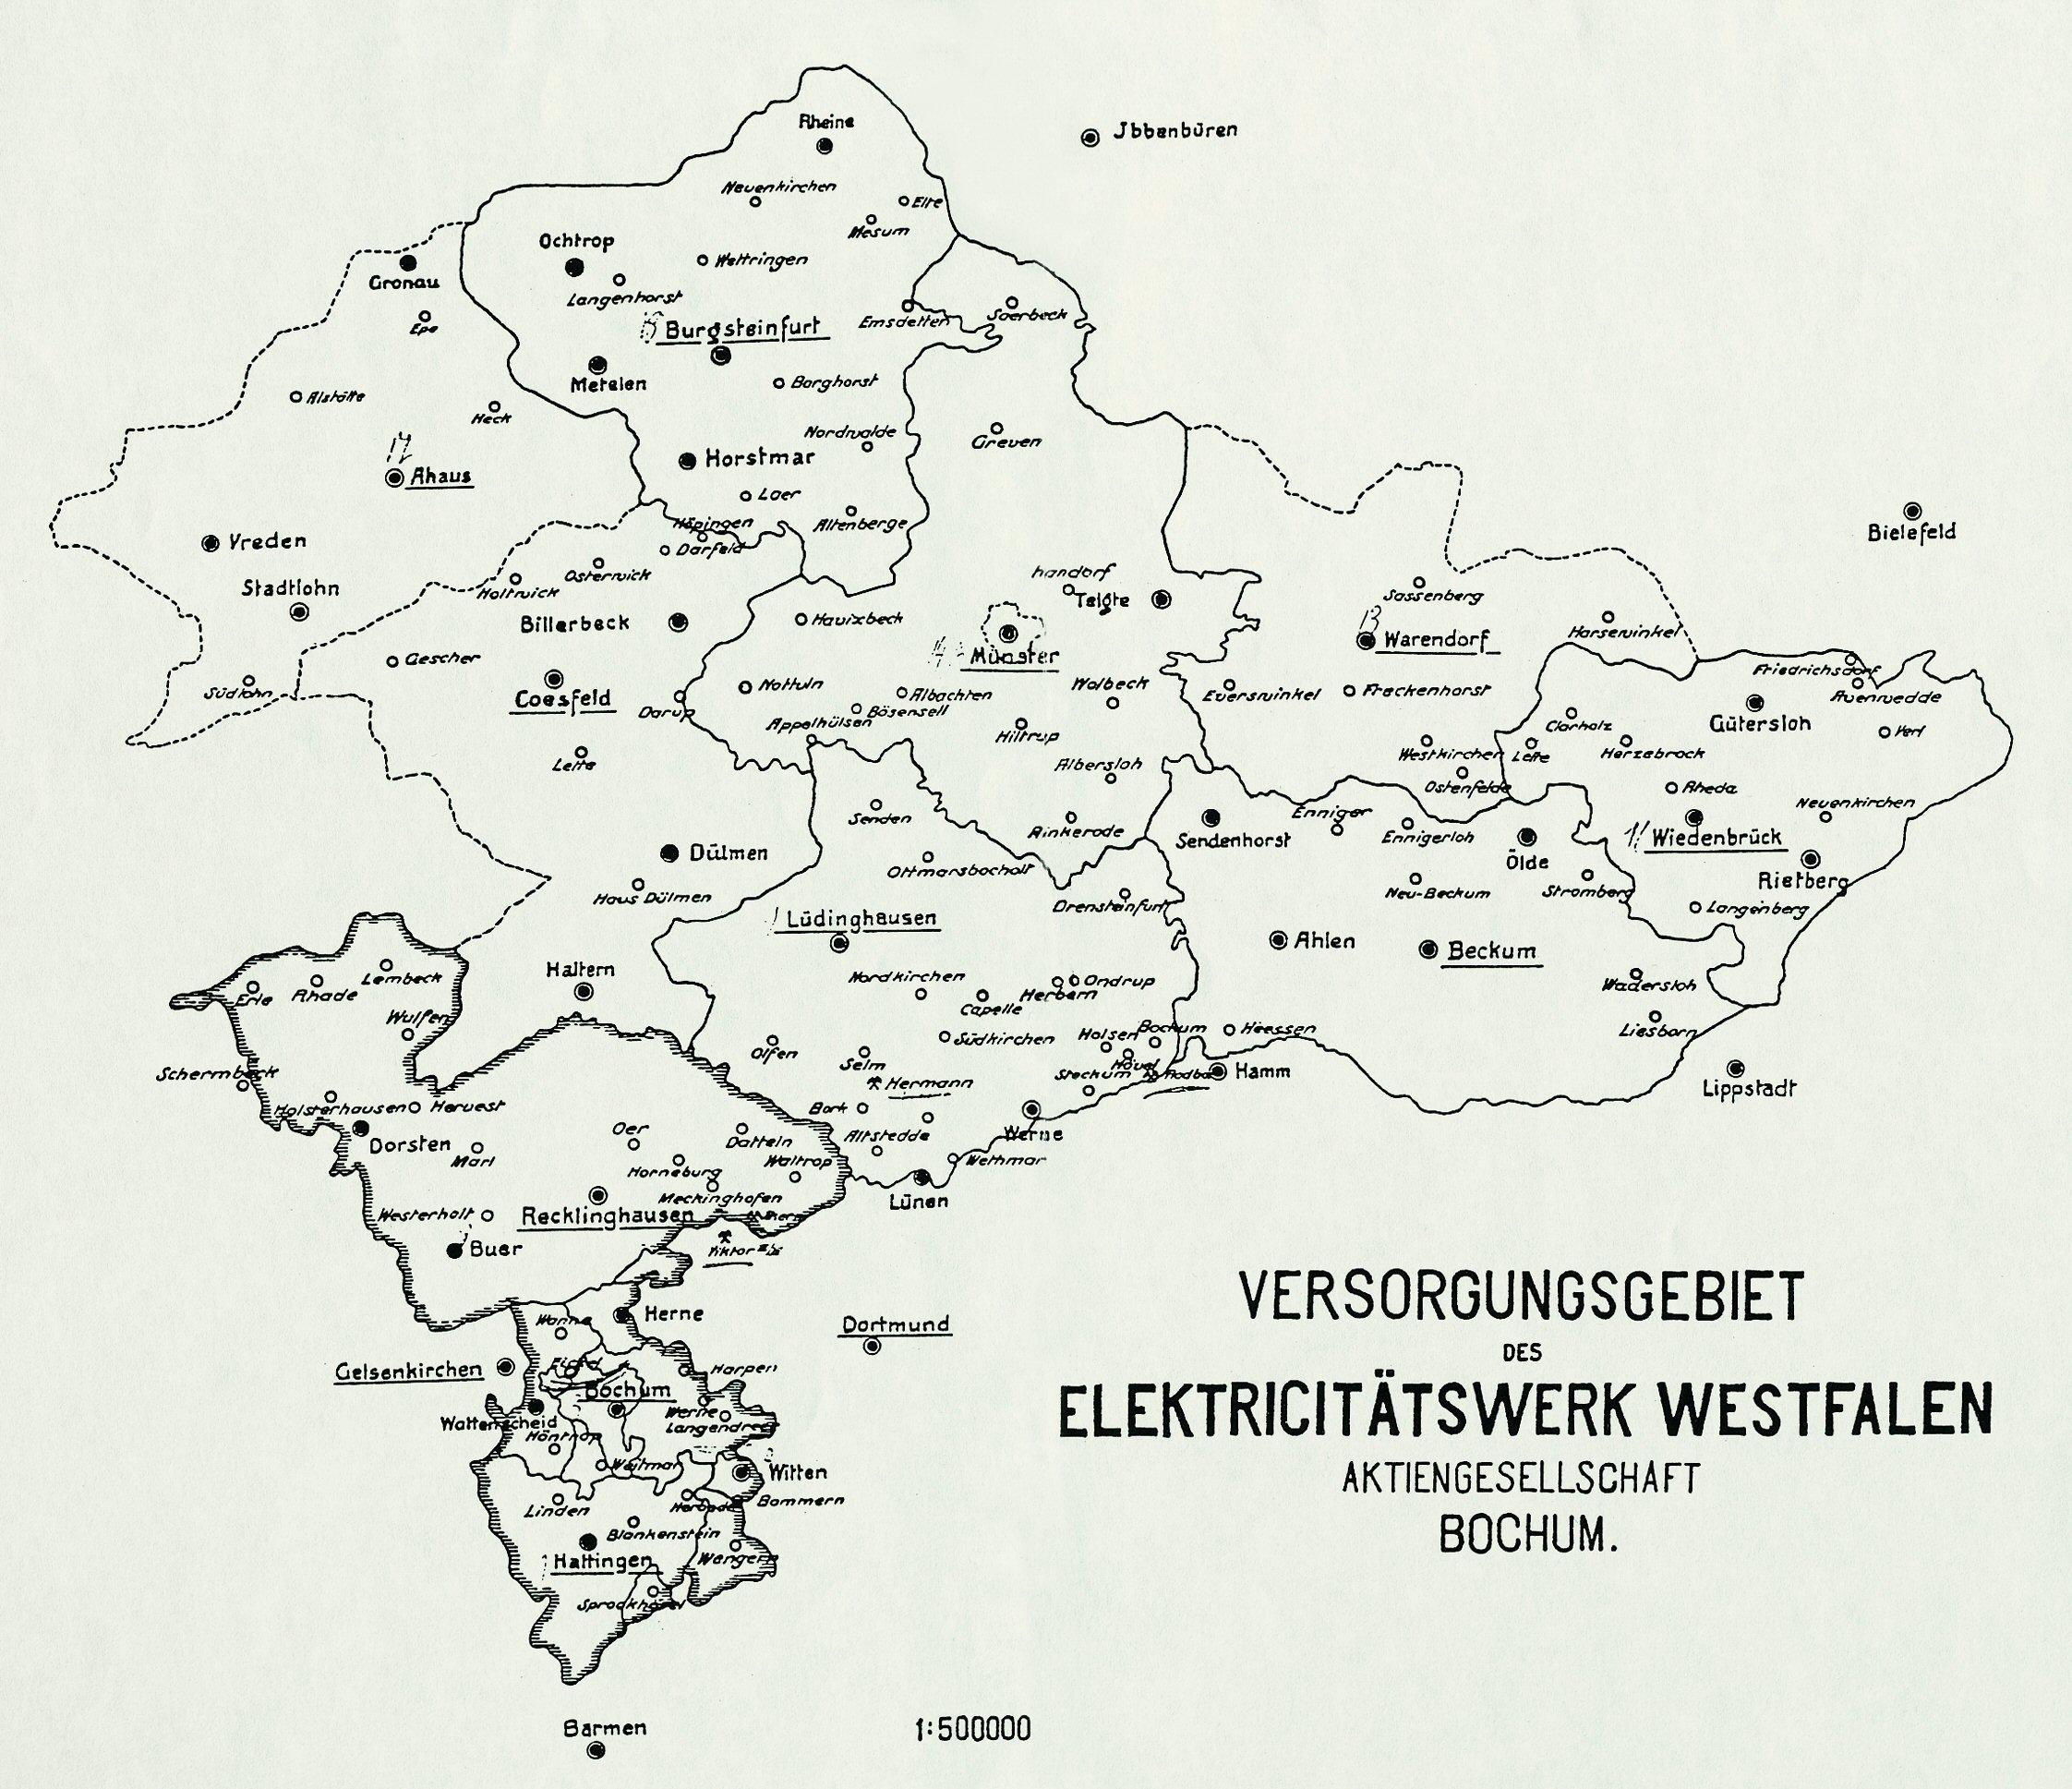 Karte: Archiv der RWE Westfalen-Weser-Ems AG, www.westfaelische-geschichte.de/kar18